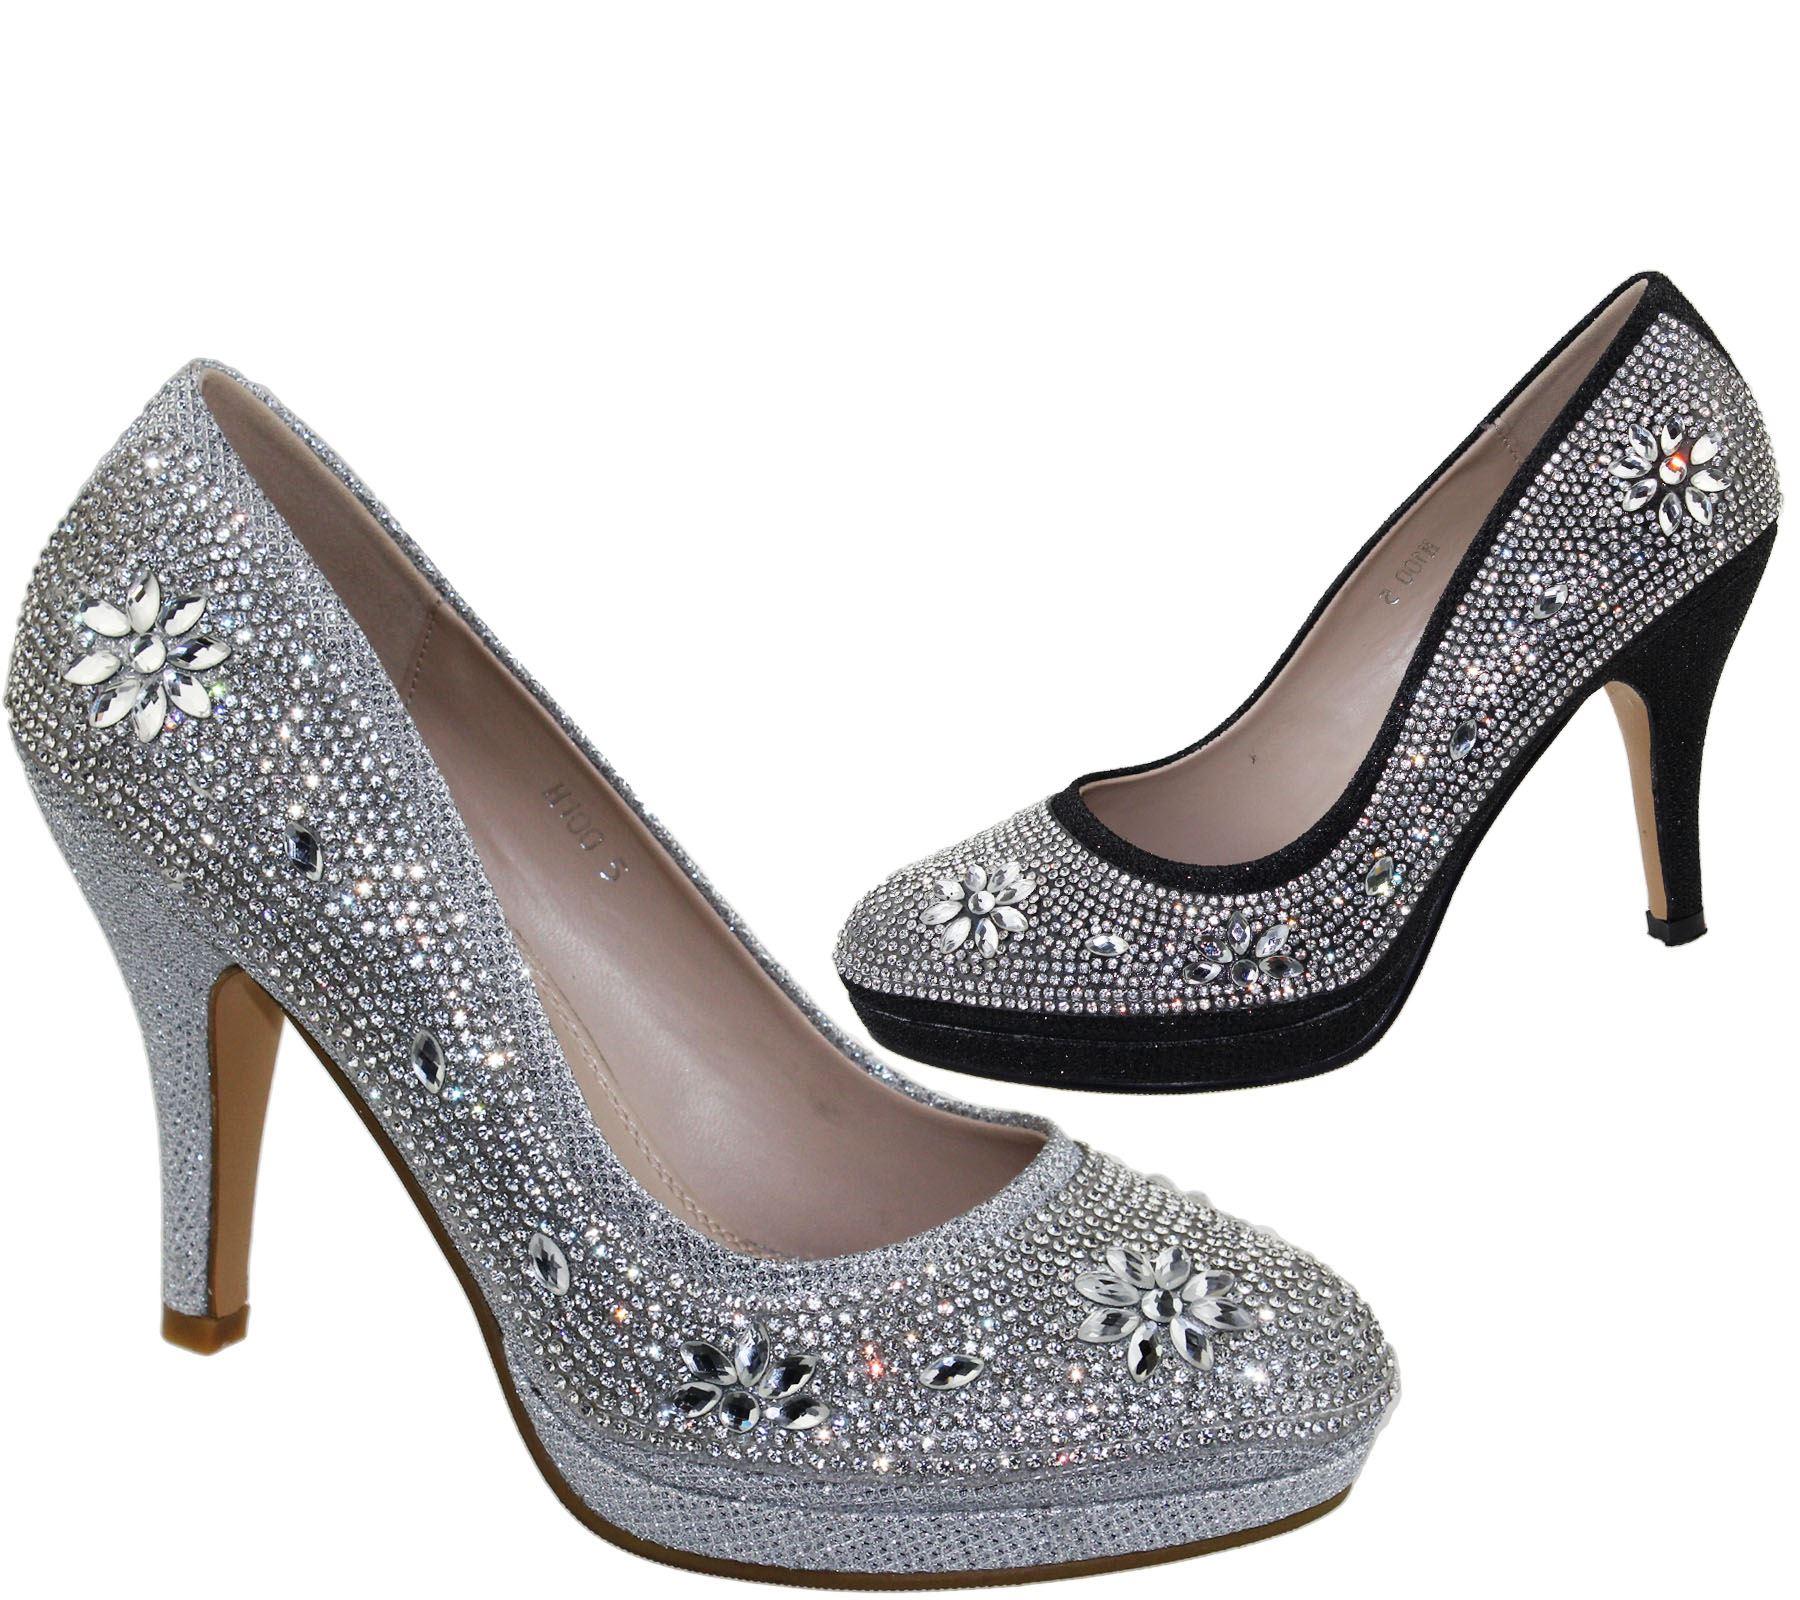 Womens-Platforms-High-Heels-Wedding-Bridal-Evening-Diamante-Ladies-Party-Shoes miniatura 19